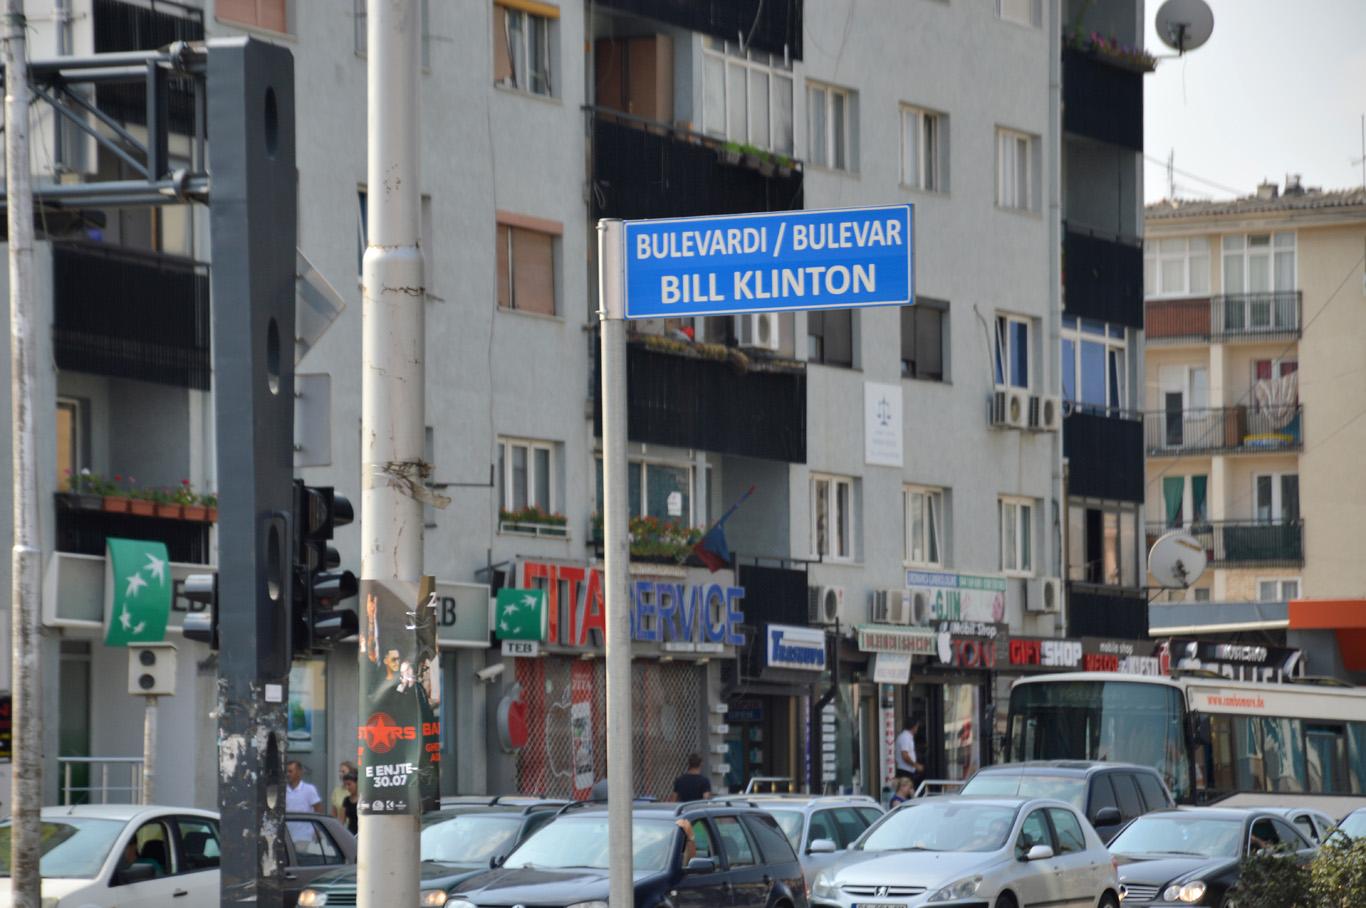 Bill Clinton Boulevard